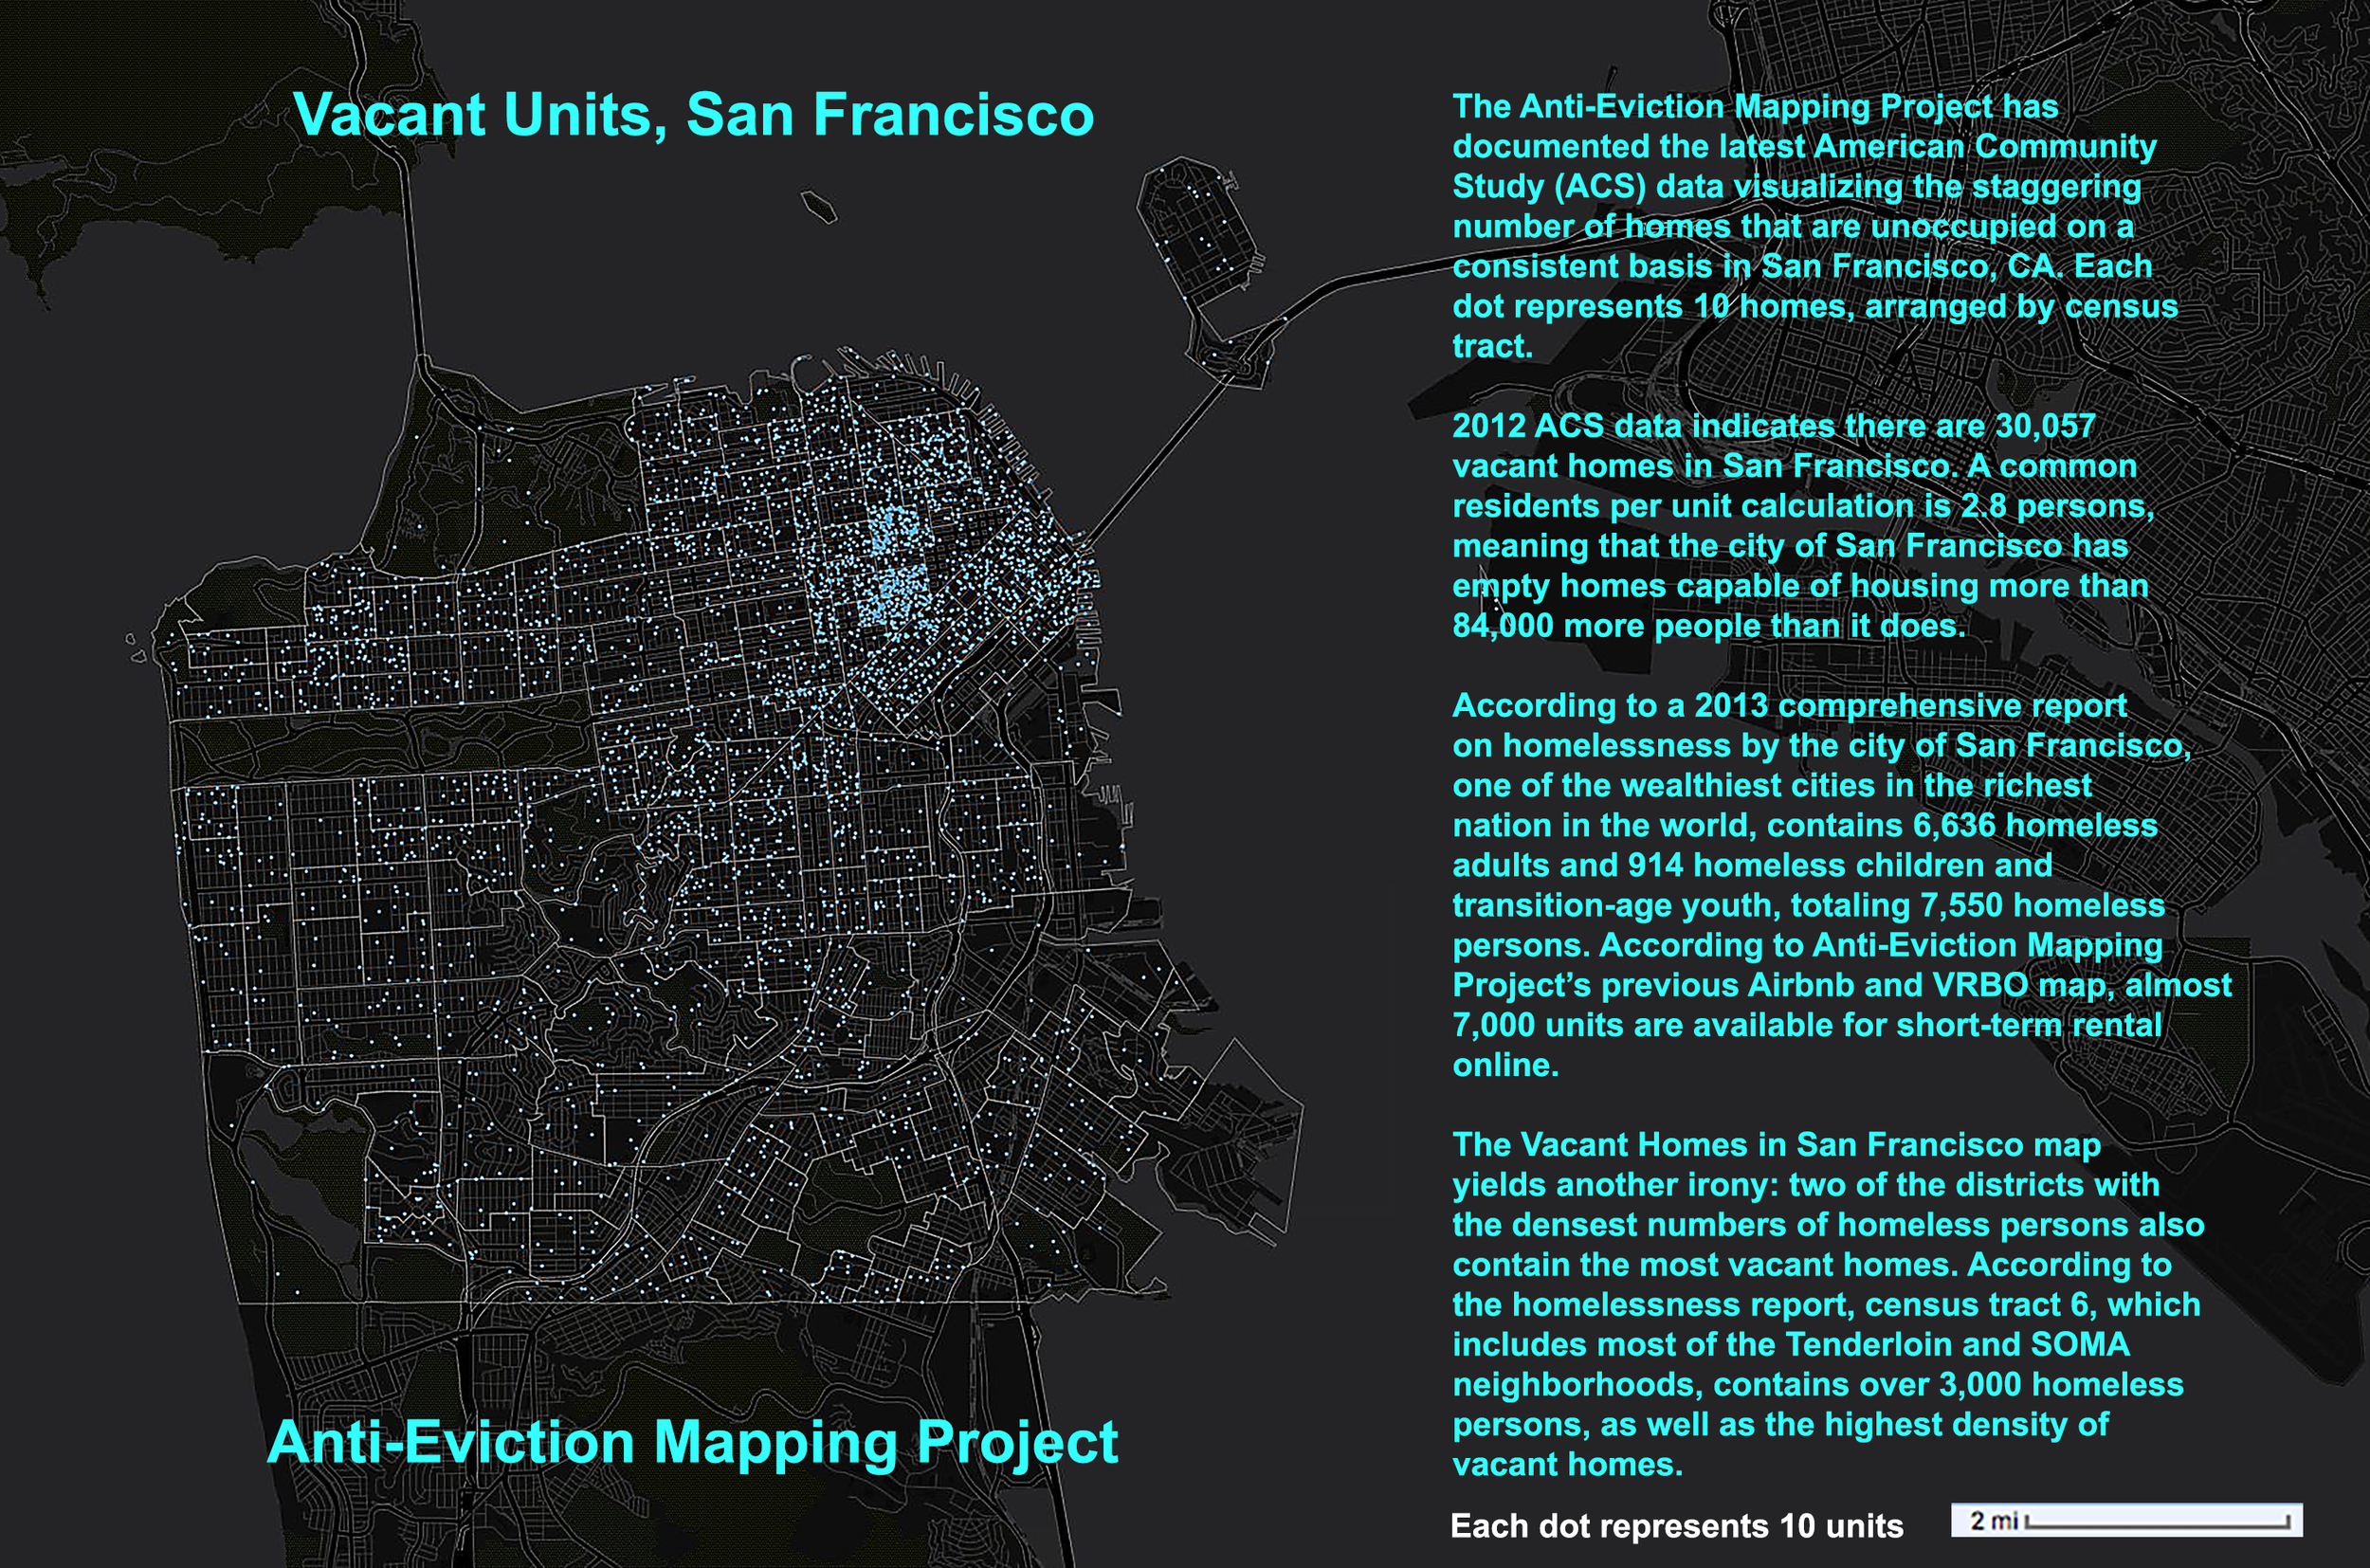 Vacant Units in San Francisco